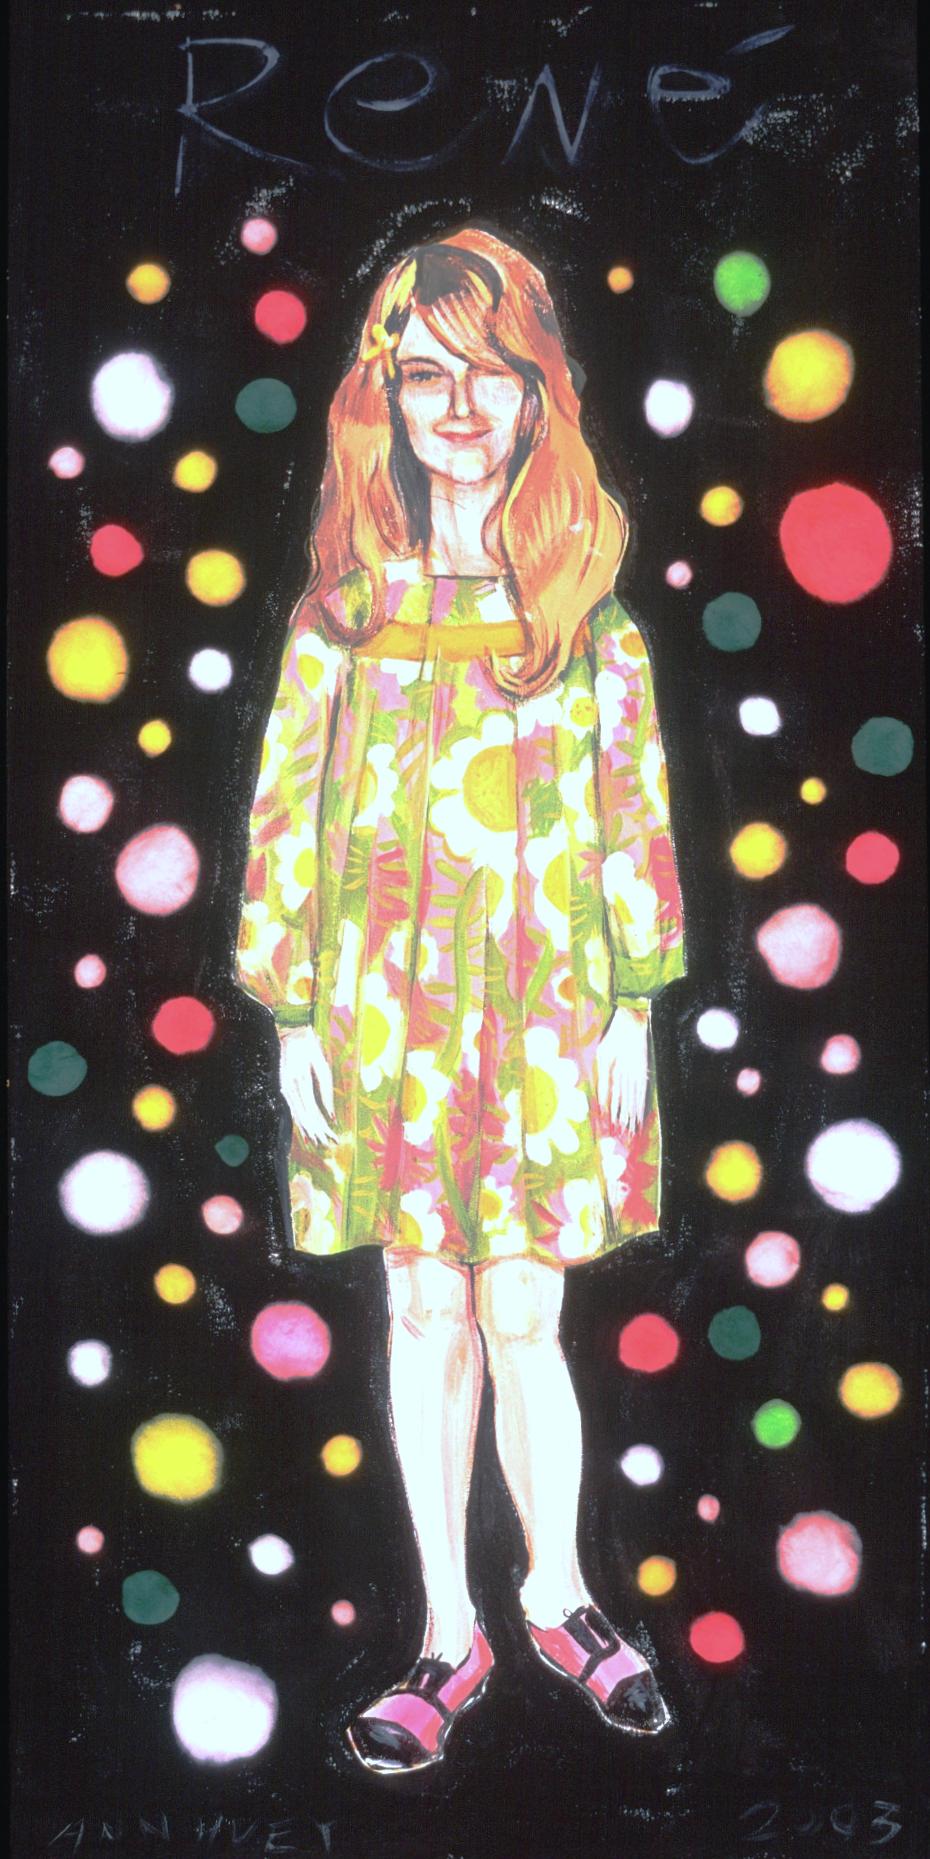 Rene - 1967